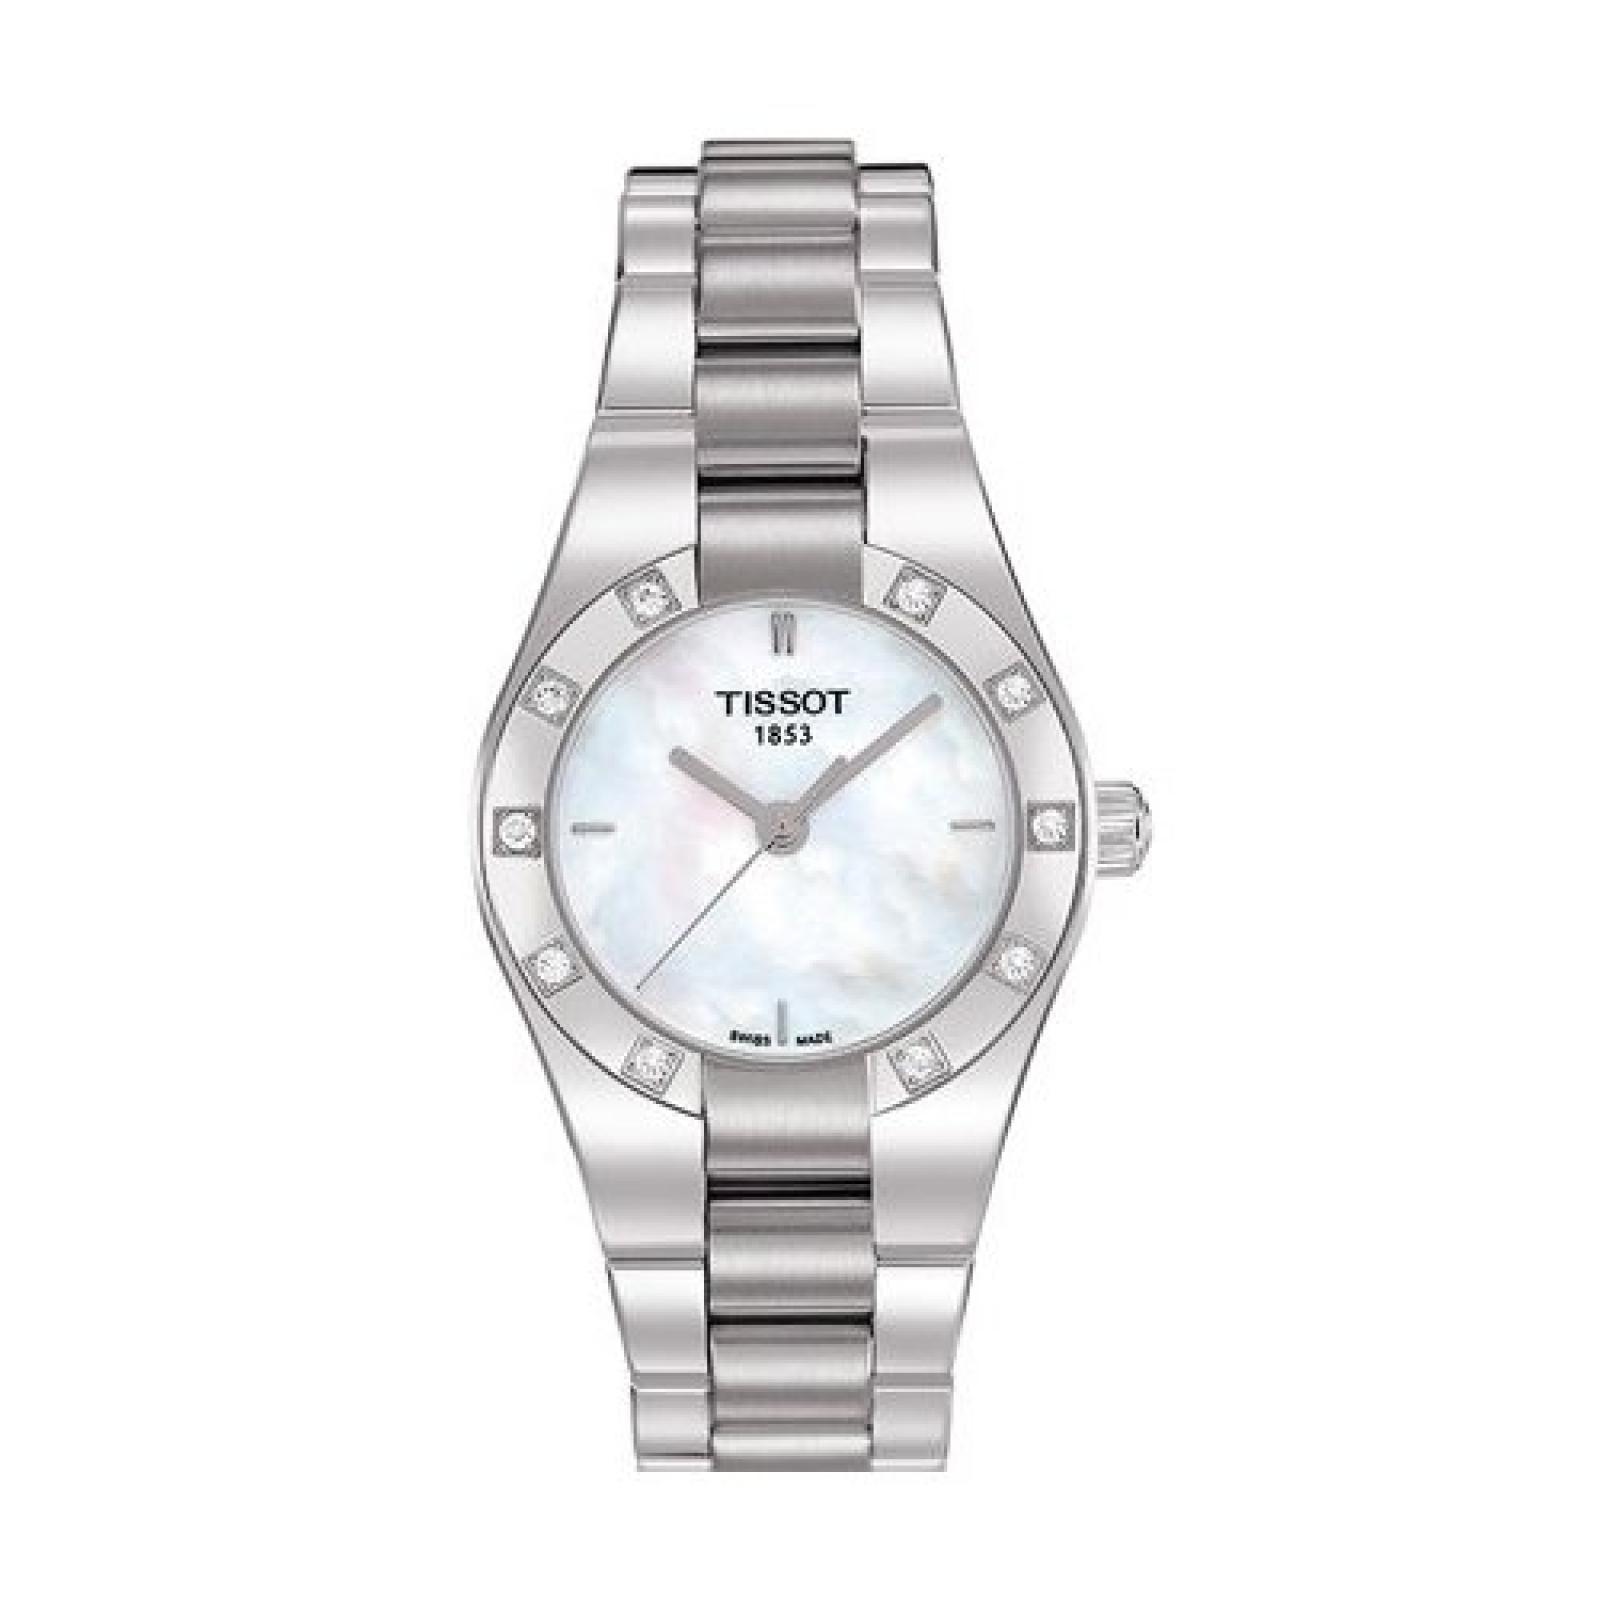 Tissot Damen-Armbanduhr GLAMSPORT T0430106111100